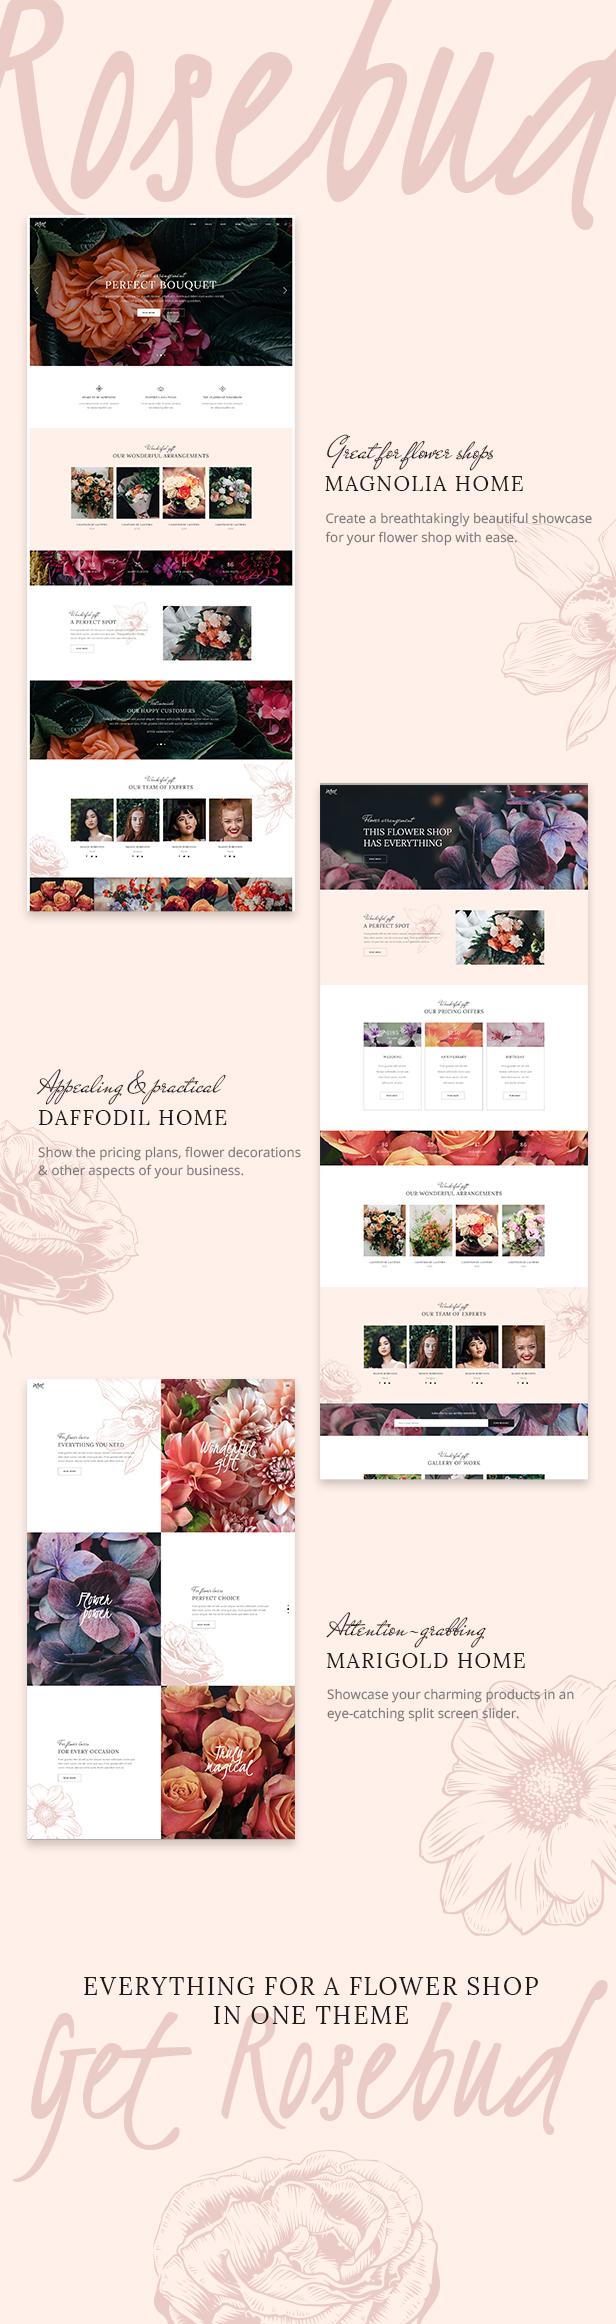 Rosebud - Flower Shop and Florist WordPress Theme - 1